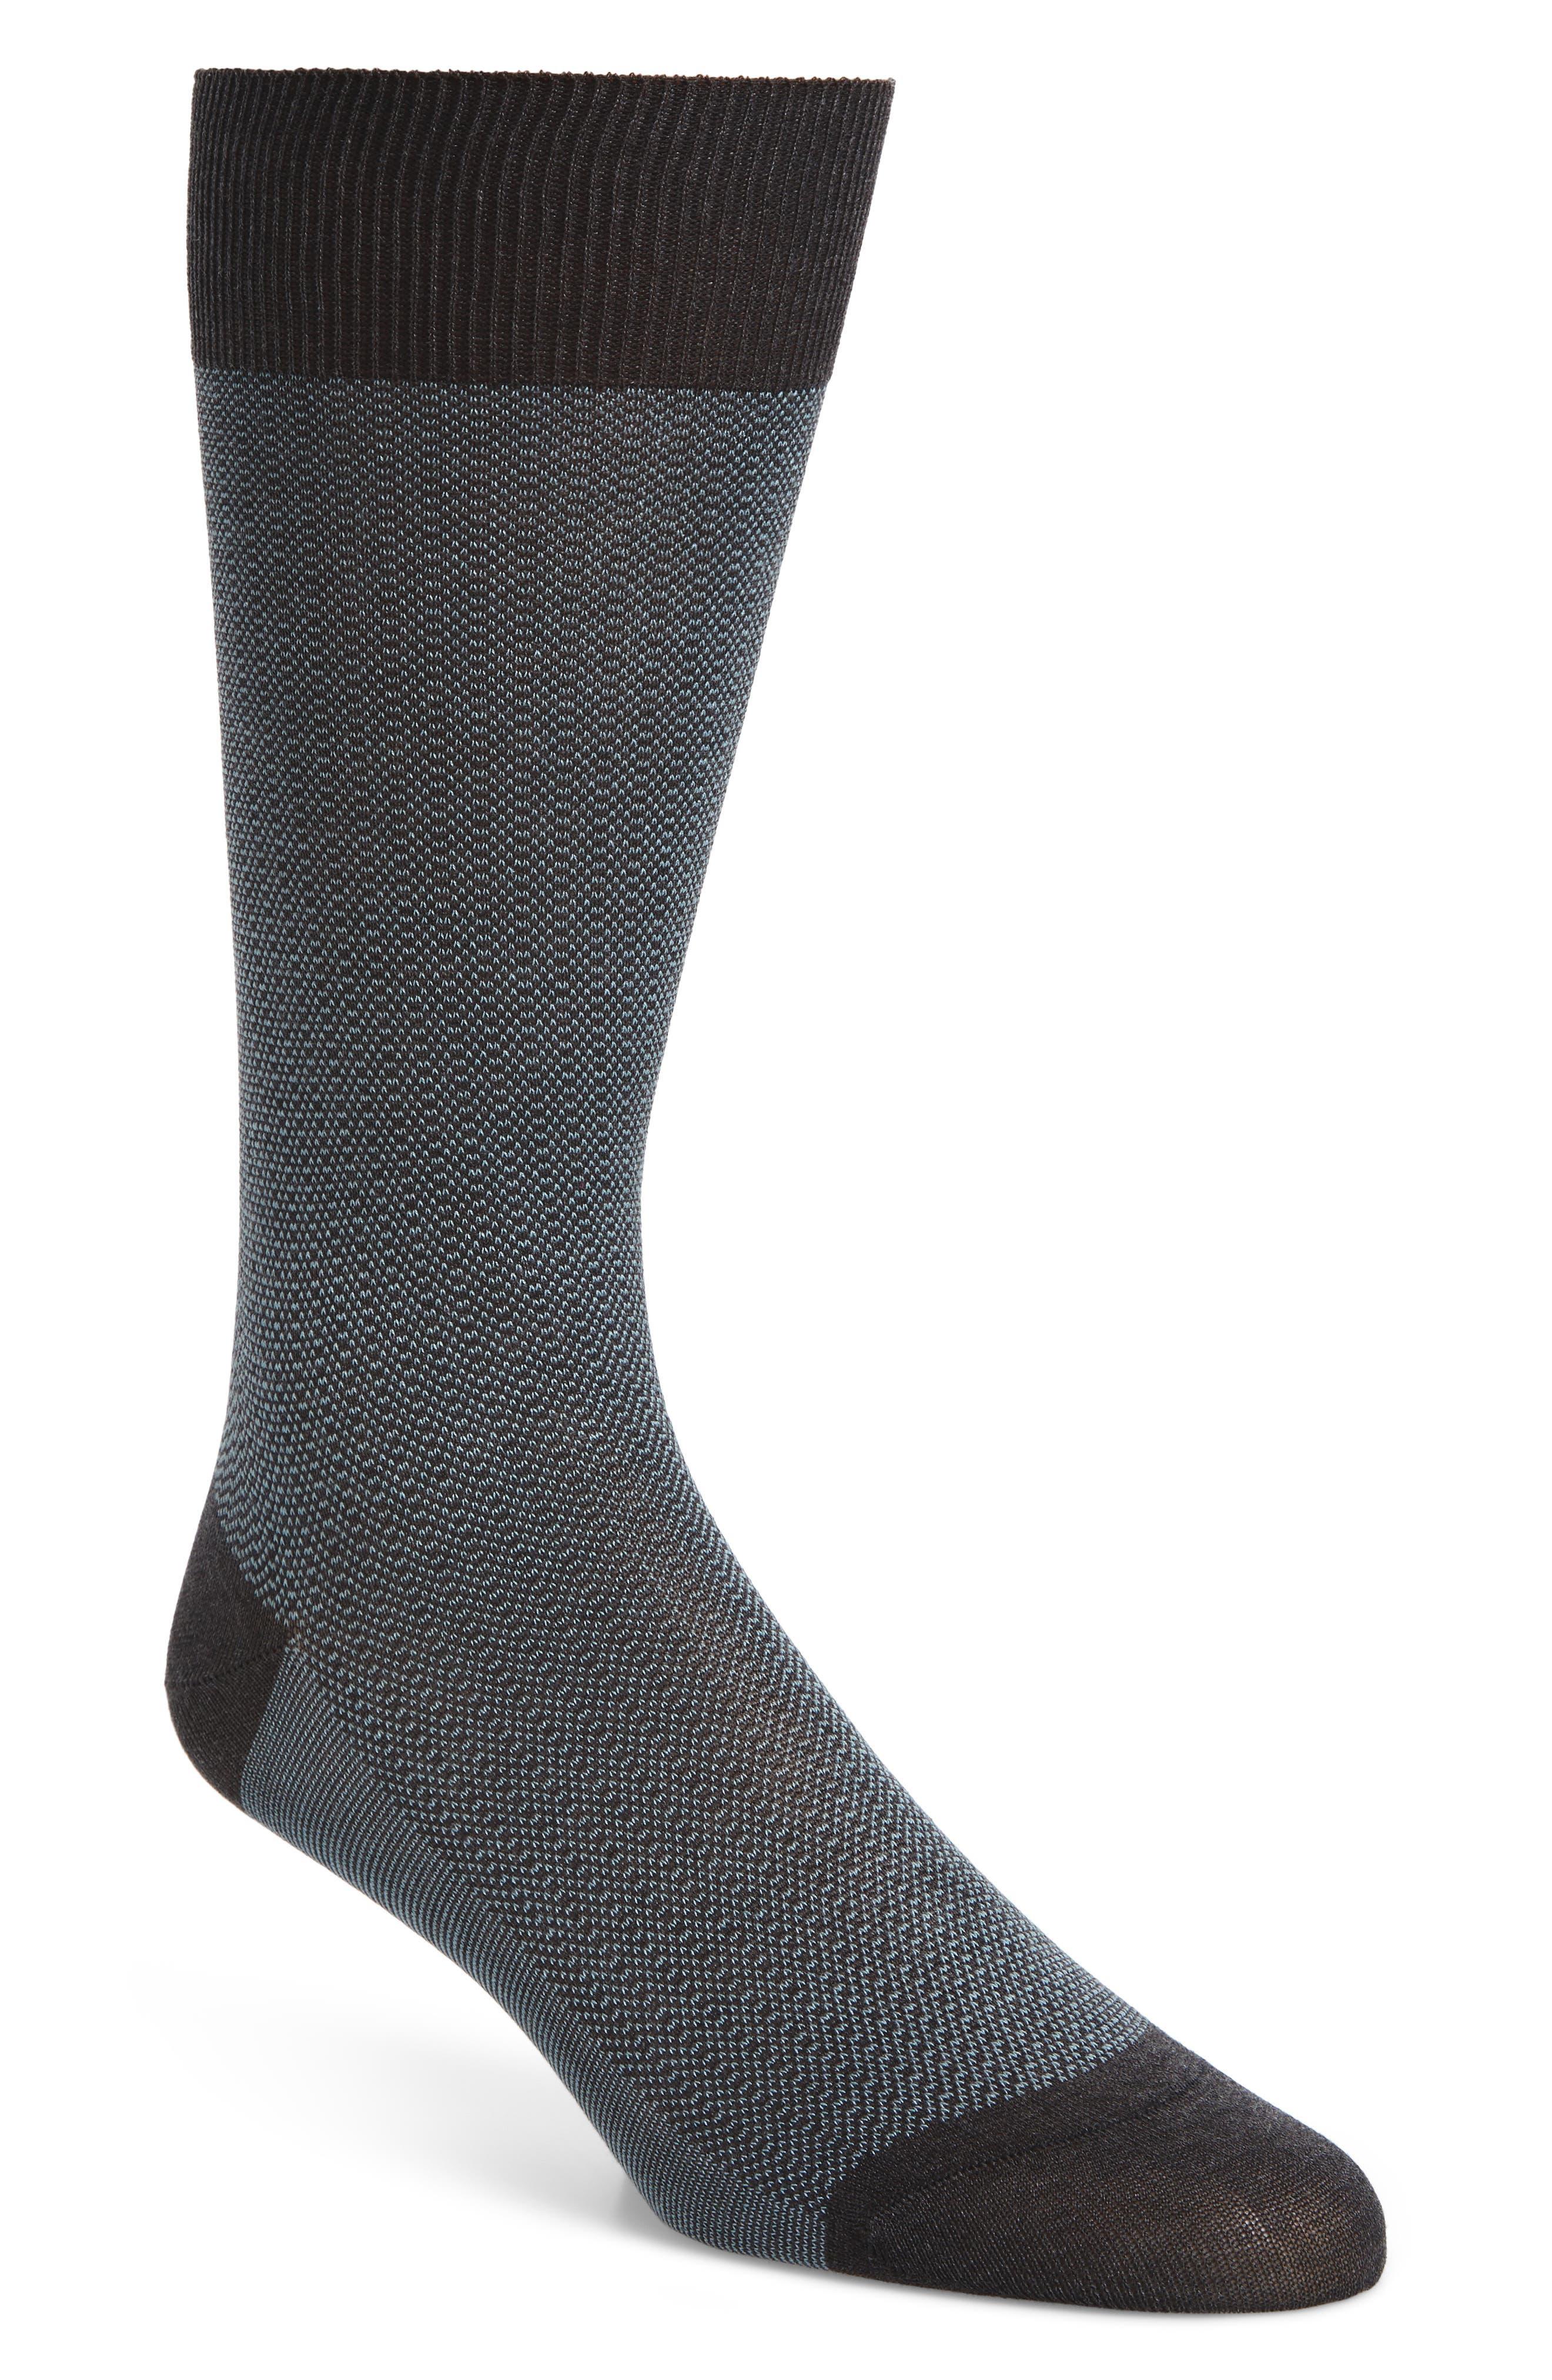 Birdseye Stripe Socks,                         Main,                         color, Dark Grey